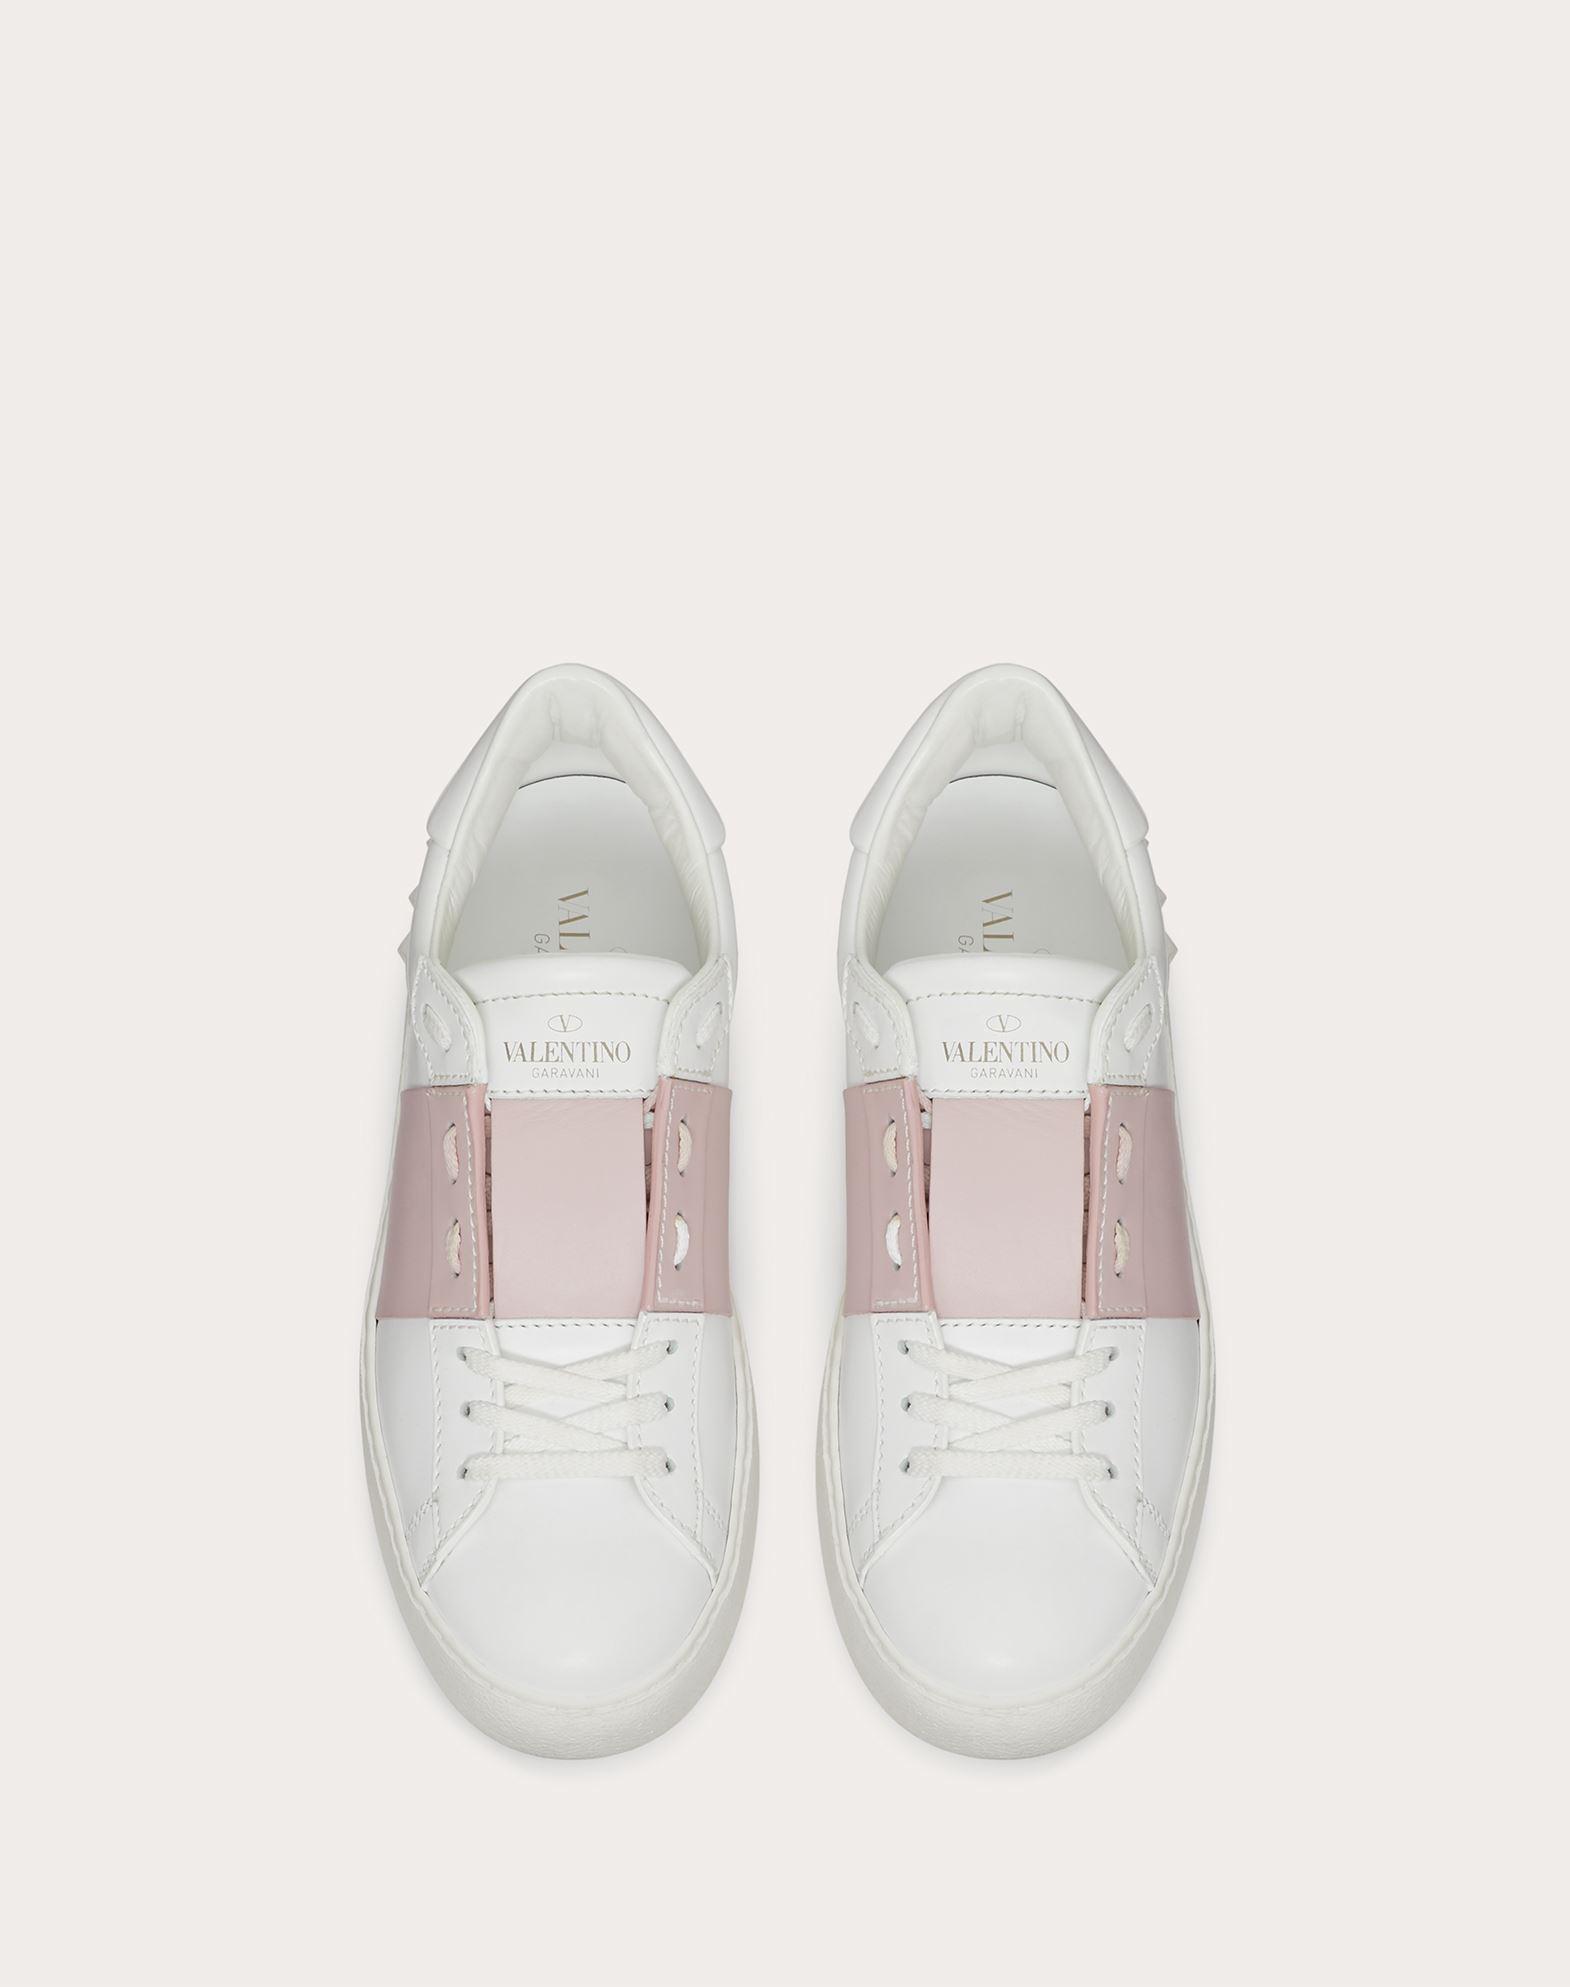 VALENTINO GARAVANI MW2S0781BLU 834 Sneaker D e